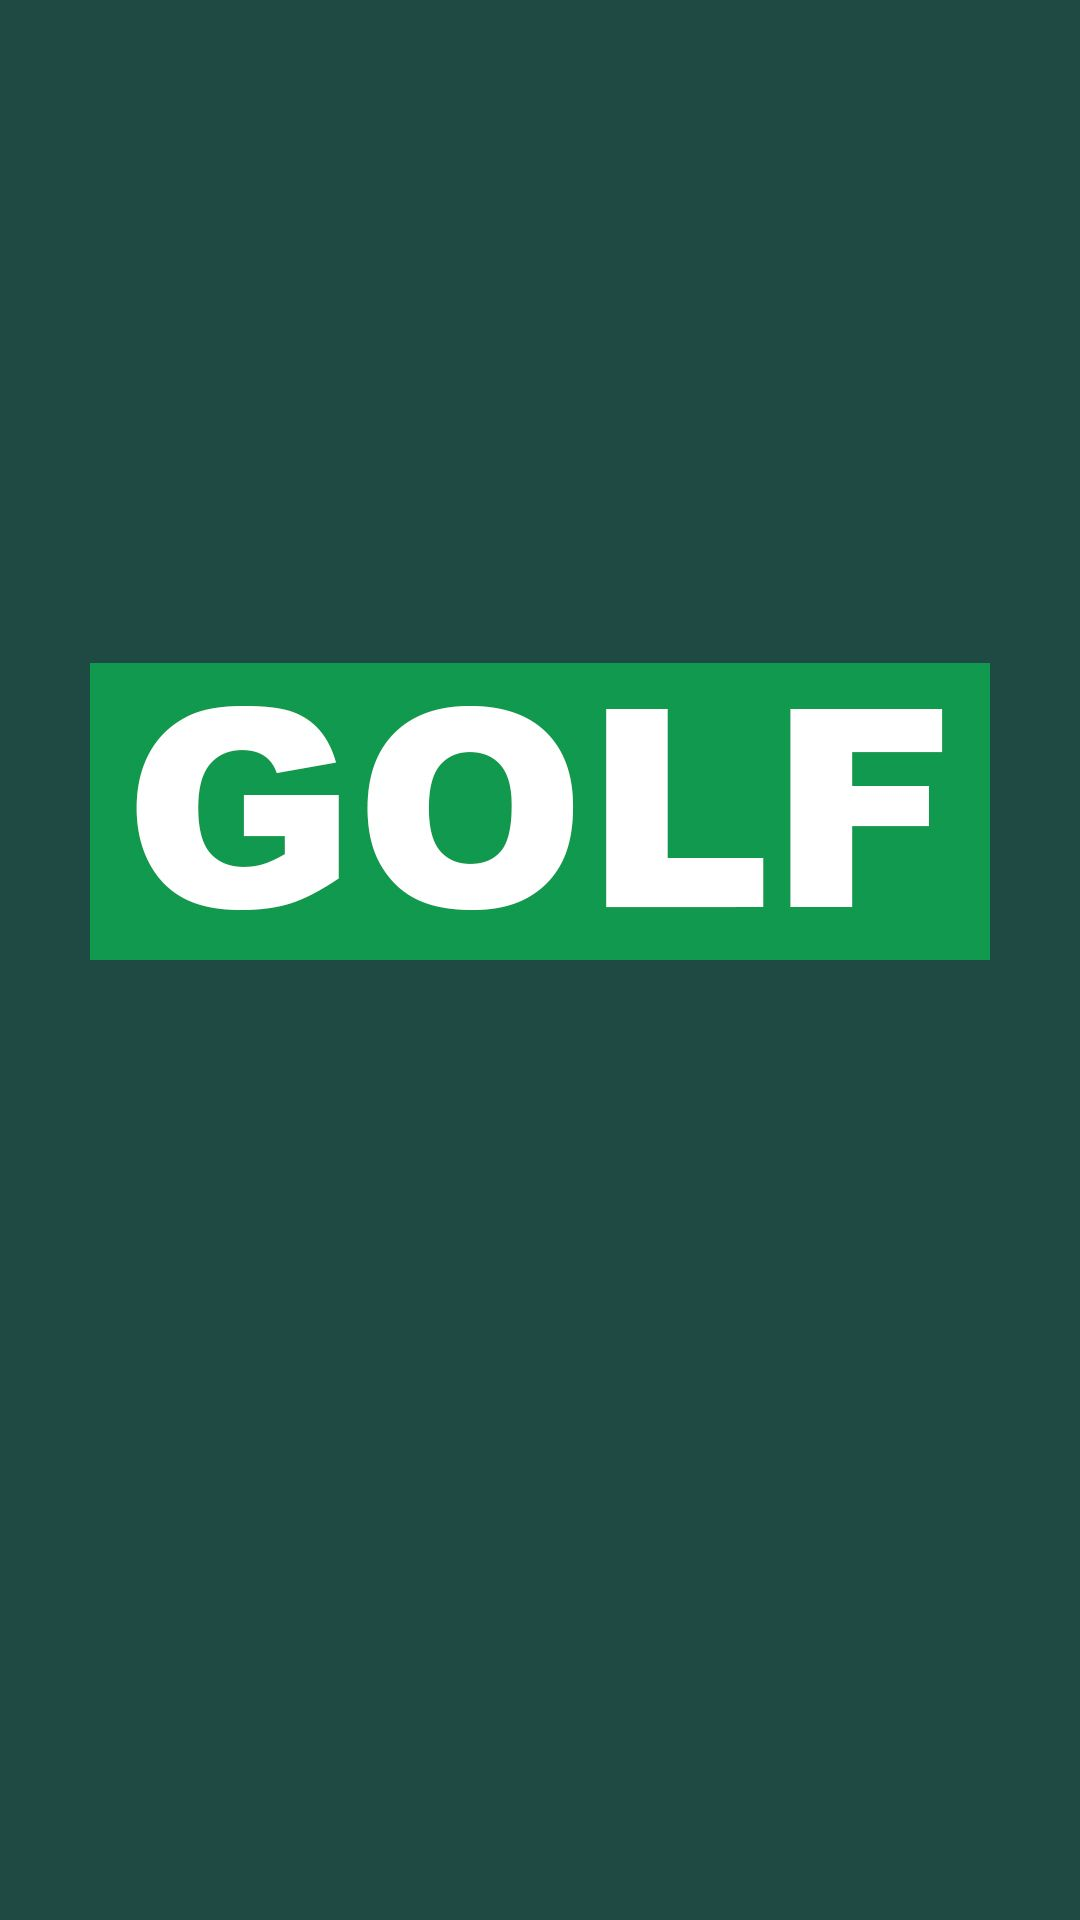 Golf Wang Iphone 5 Wallpapers Top Free Golf Wang Iphone 5 Backgrounds Wallpaperaccess